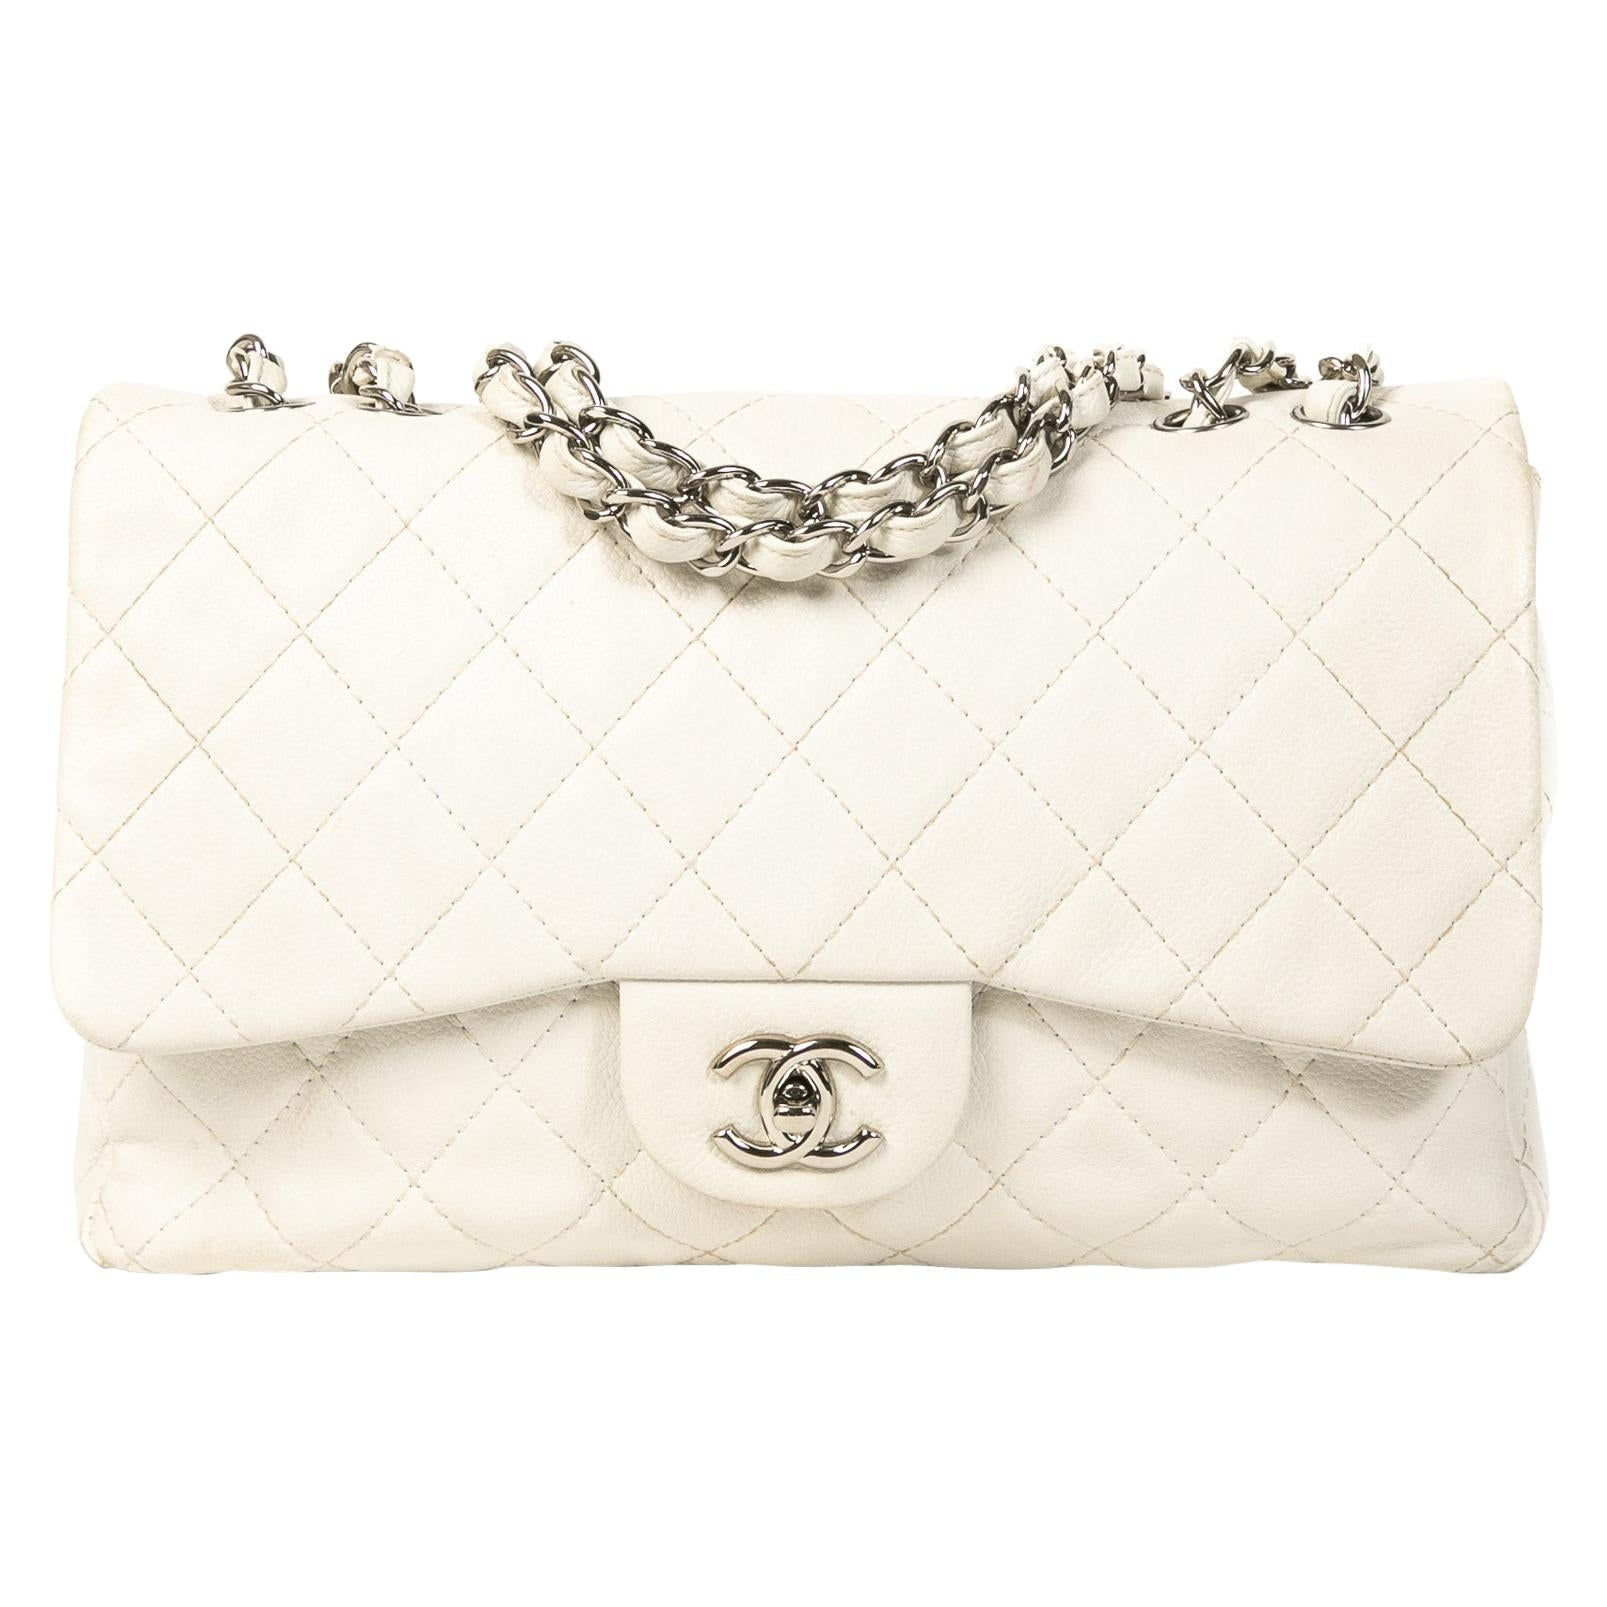 Chanel White Leather Jumbo Classic Single Flap Bag